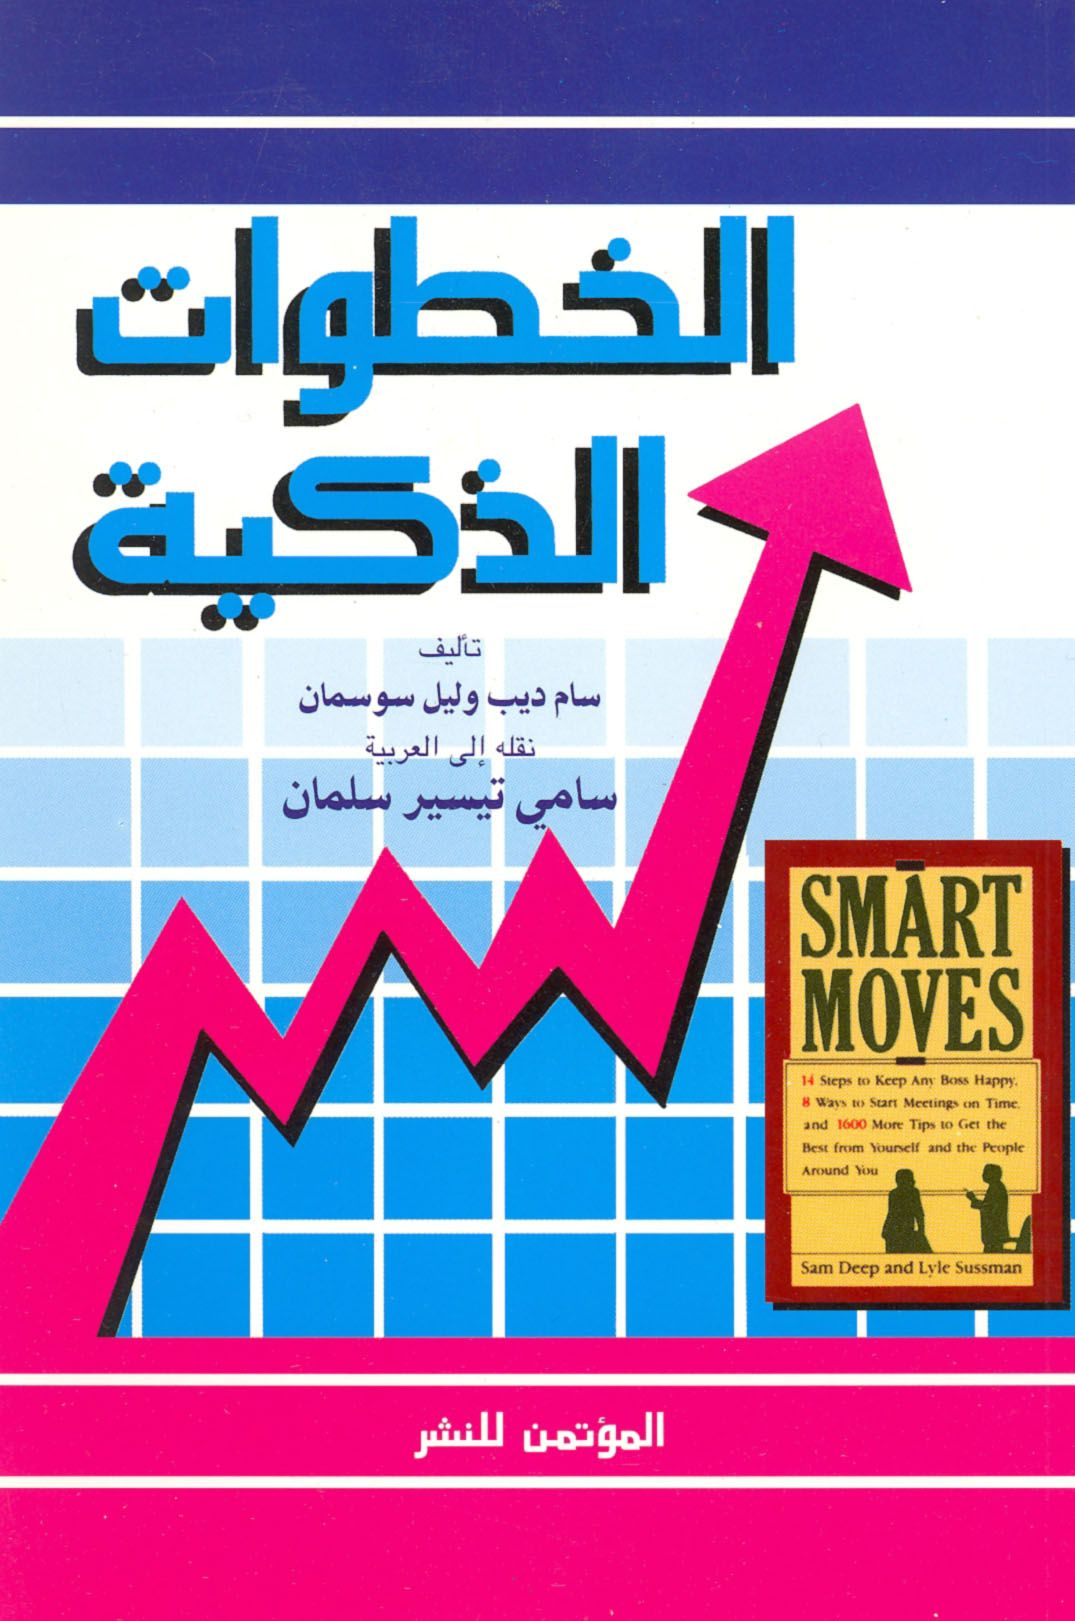 تحميل كتاب الخطوات الذكية Pdf تاليف سام ديب وليل سوسمان Pdf Books Download Books Pdf Books